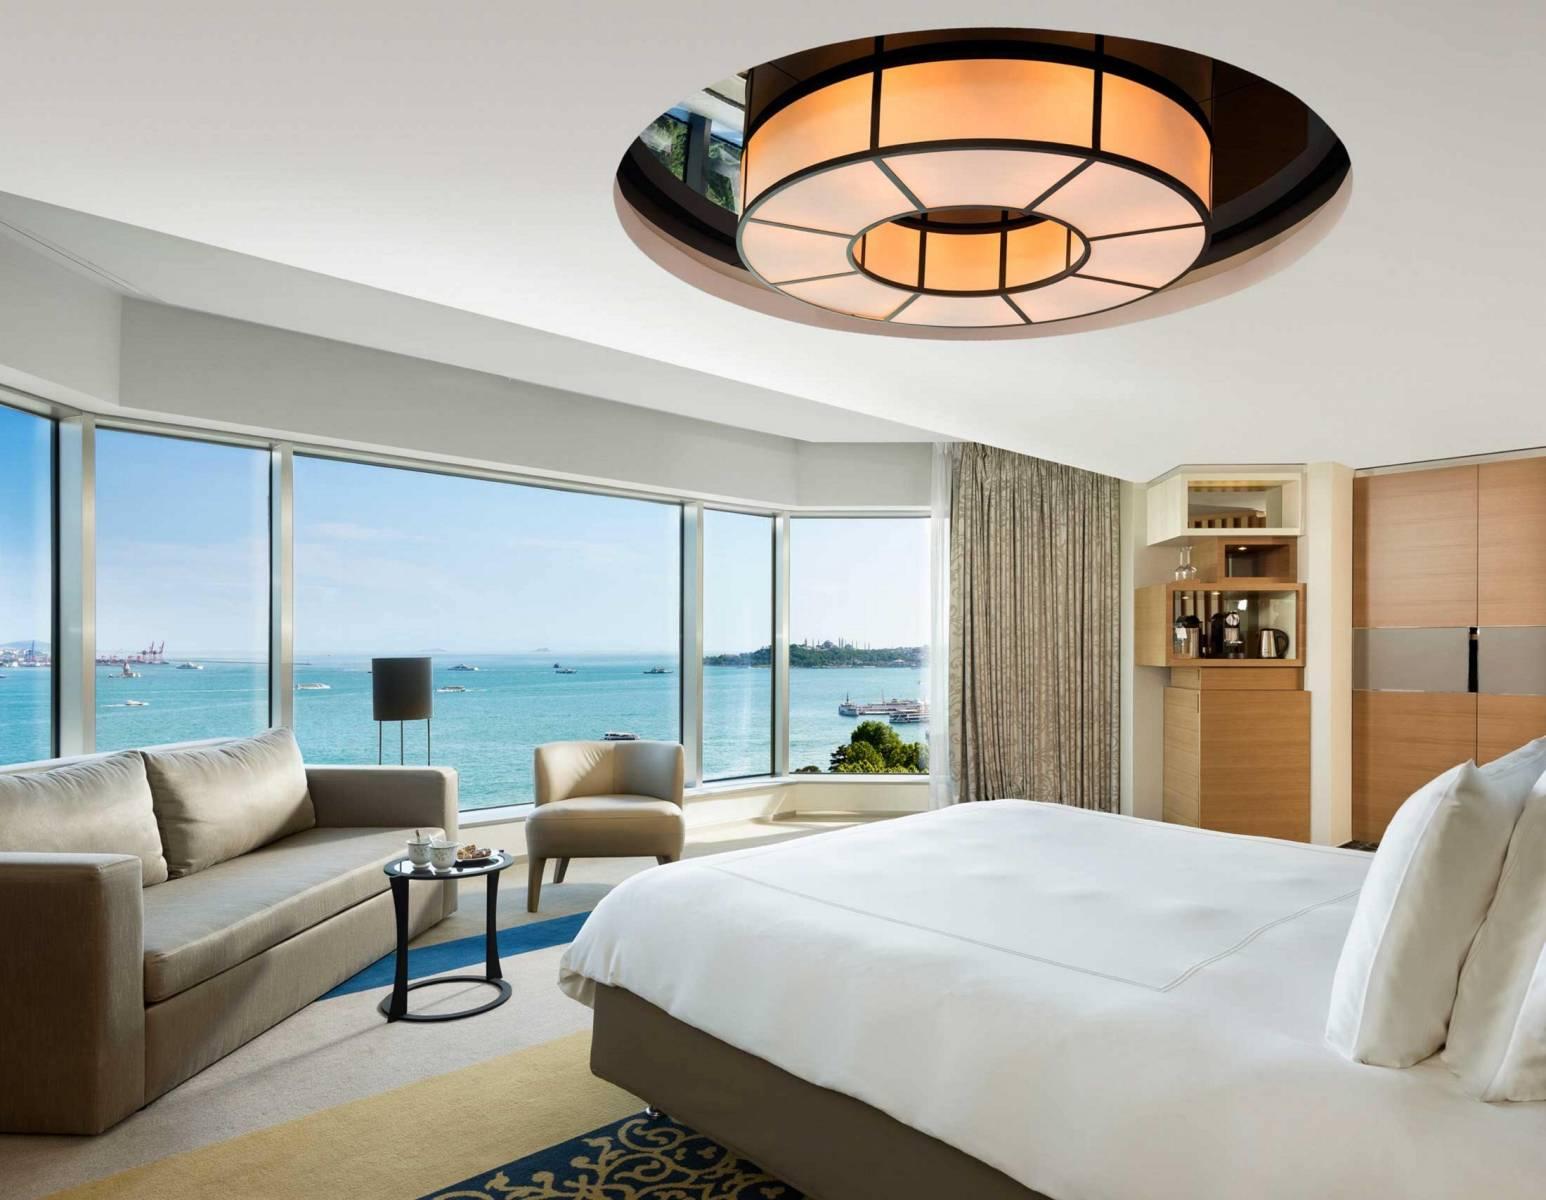 executive-corner-bosphorus-view-room-bedroom-2-min